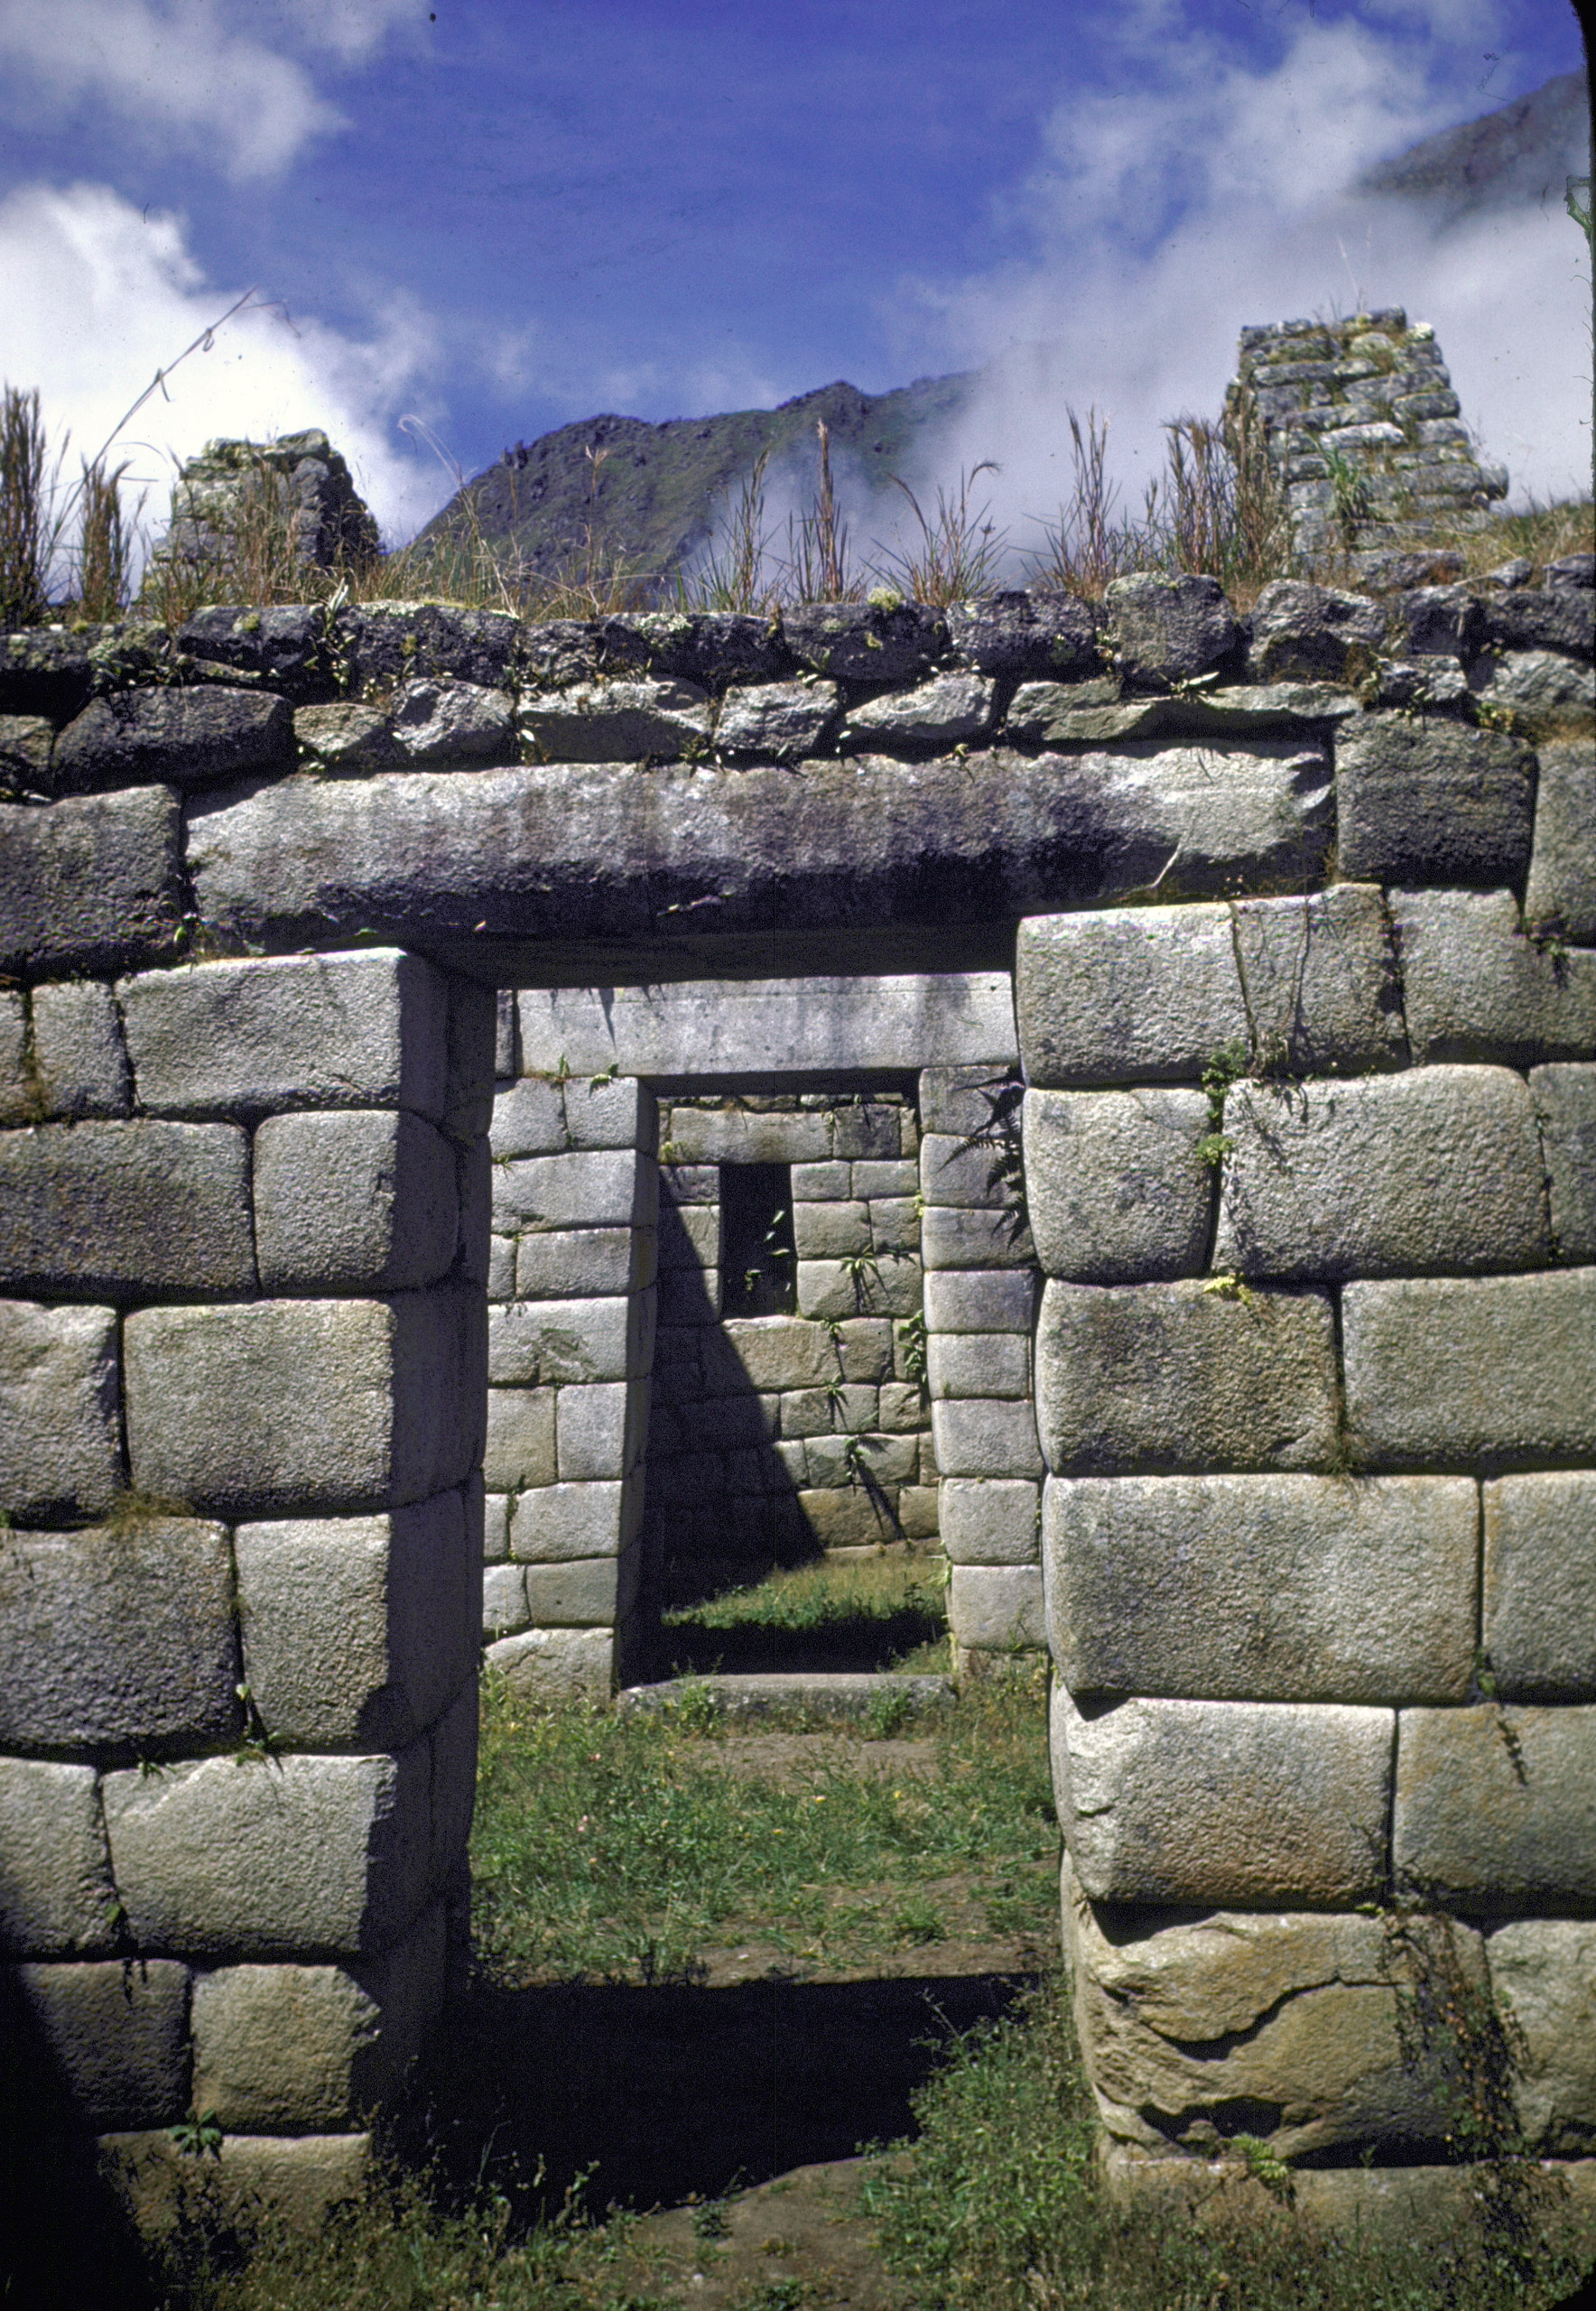 Trapezoidal entry doors at Incan ruins of Machu Picchu, 1945.